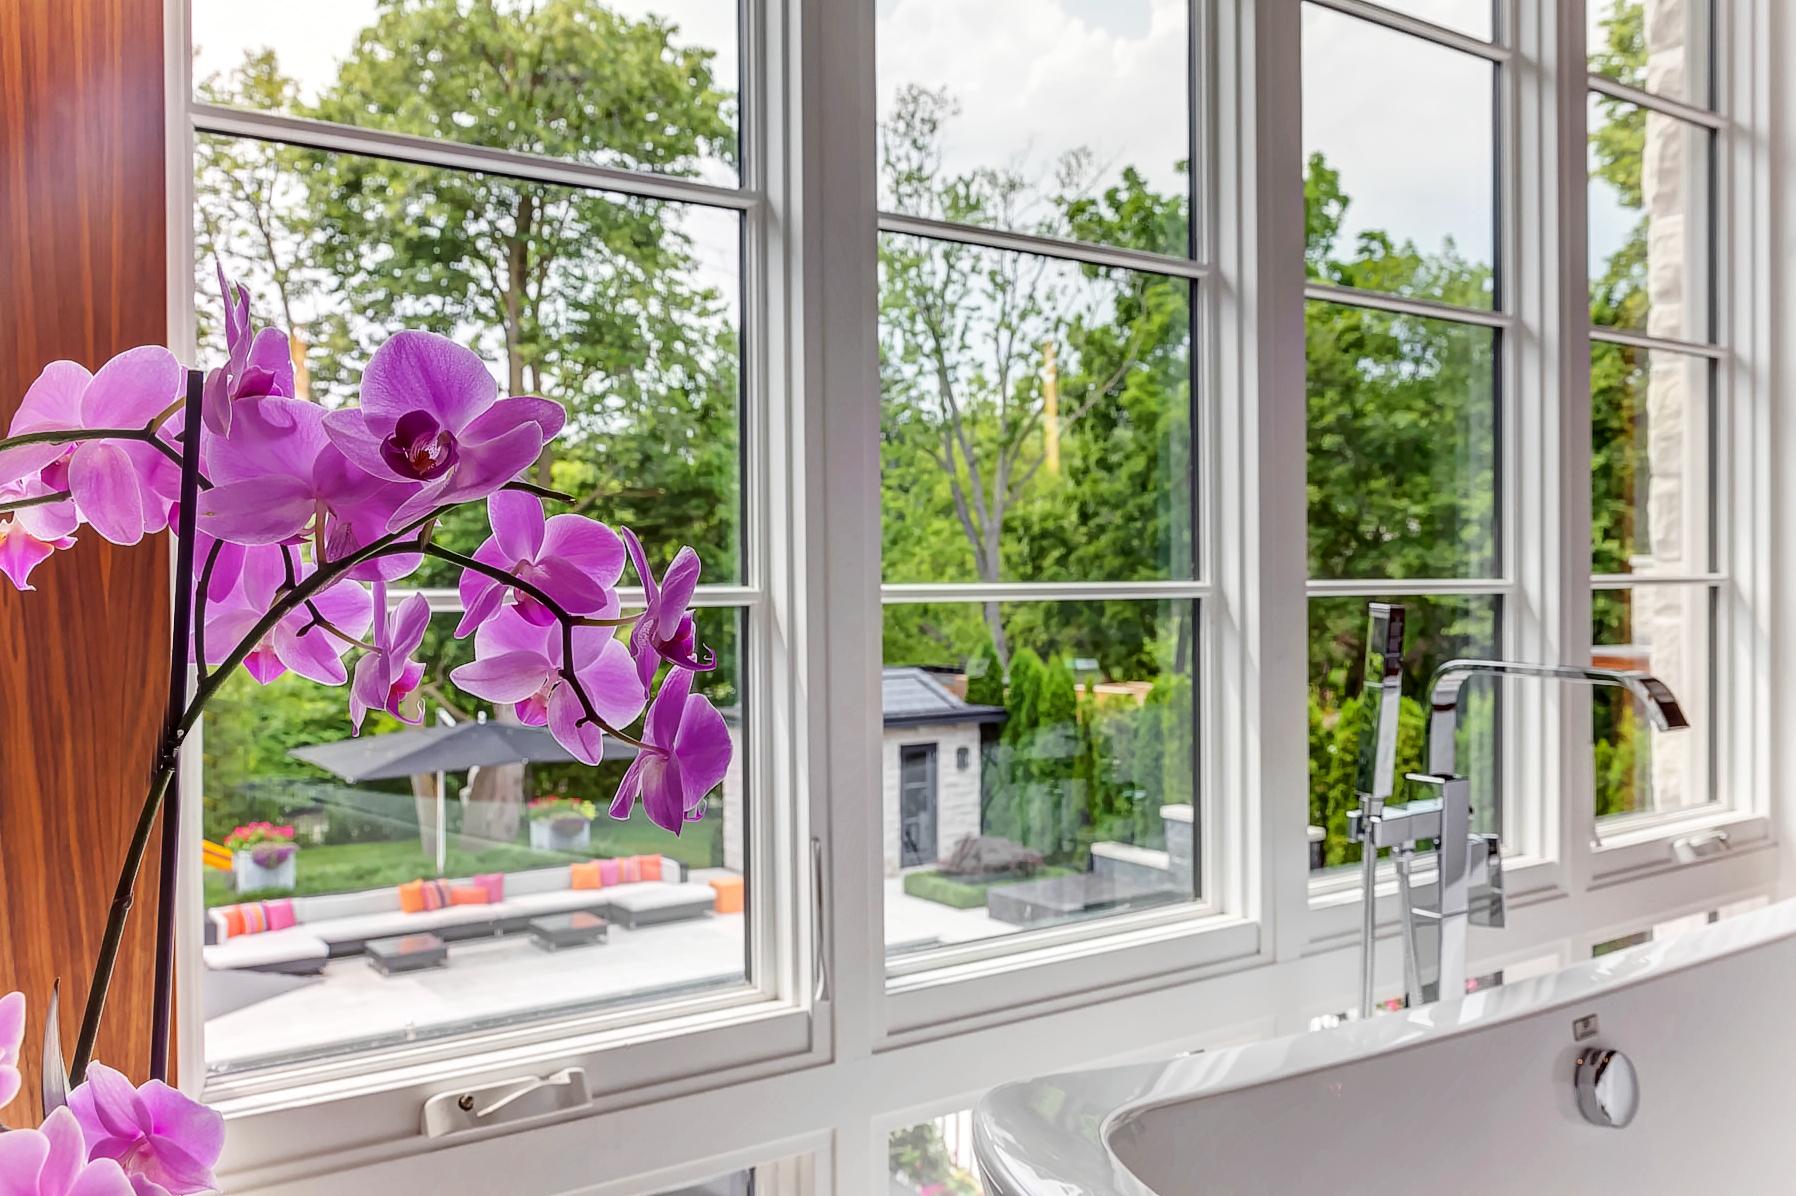 34_Bathroom_View.jpg